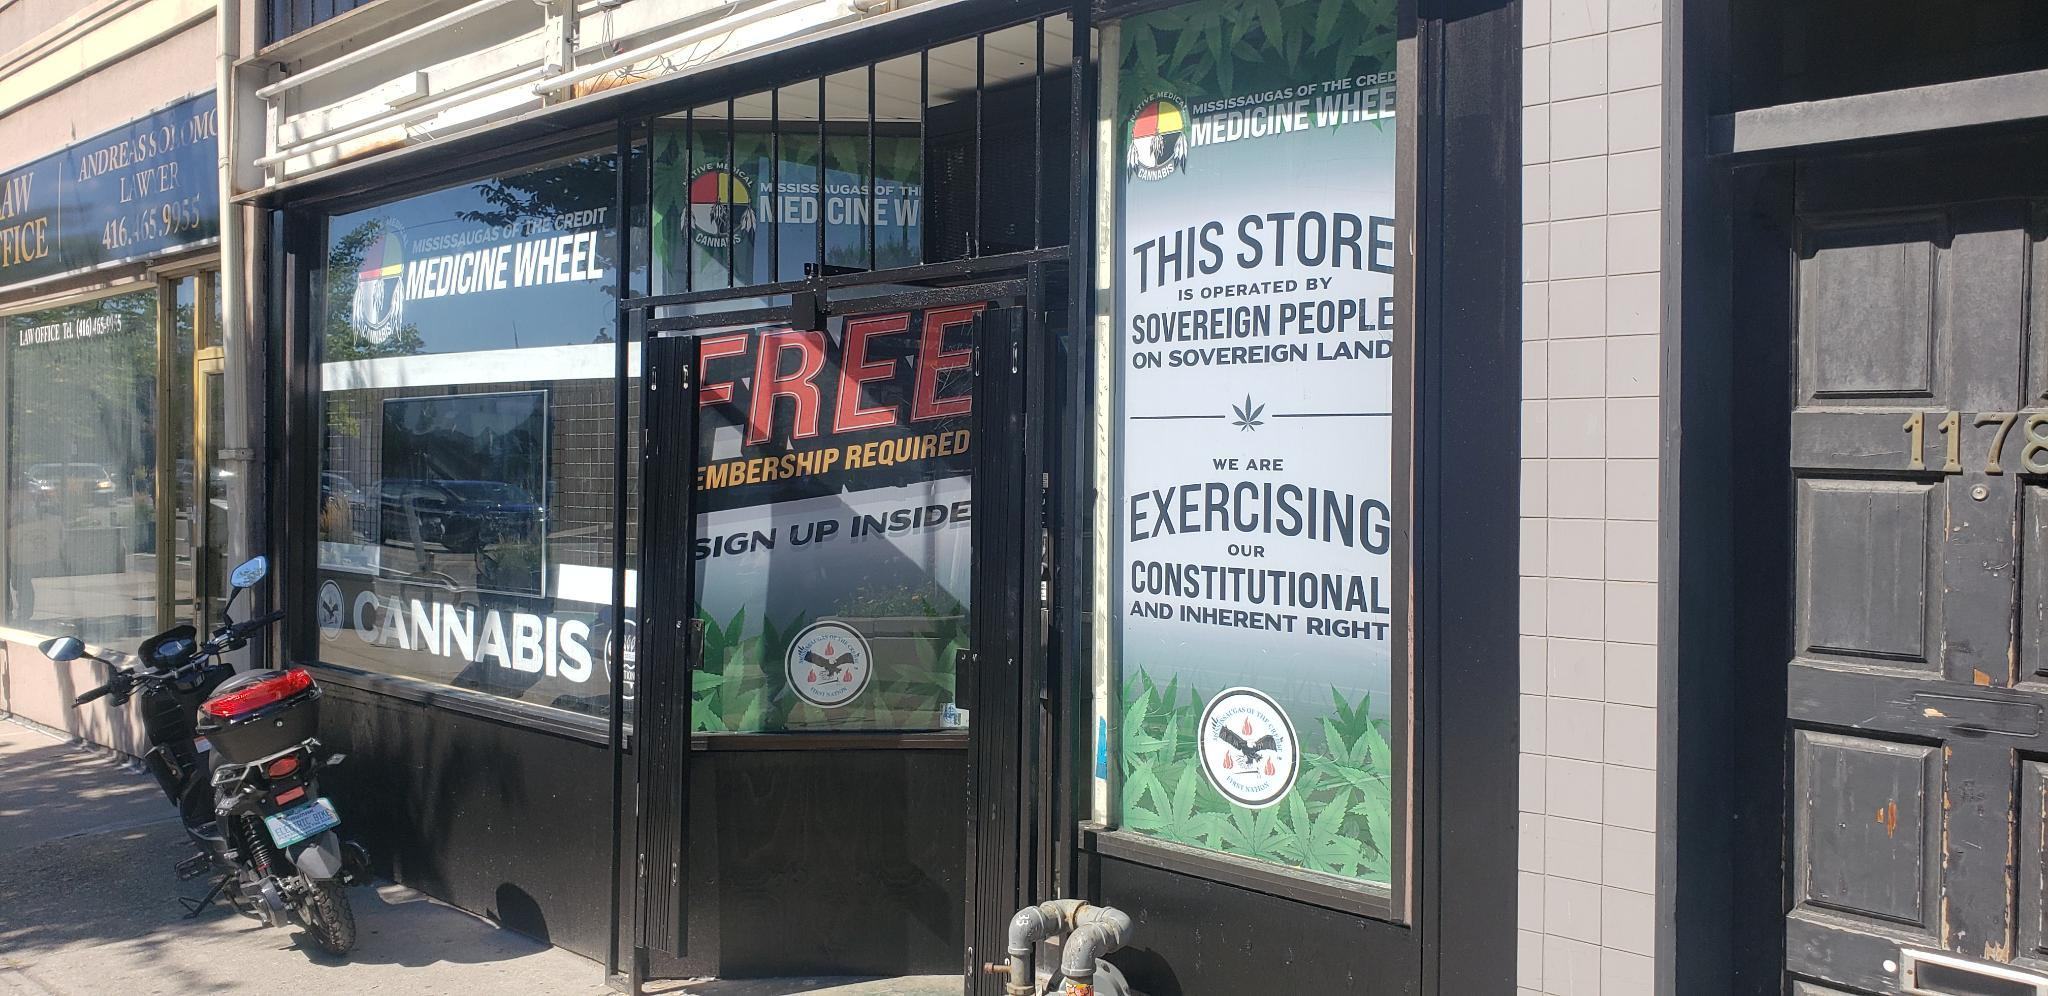 Medicine Wheel indigenous cannabis dispensary. (image credit: Dispensing Freedom)